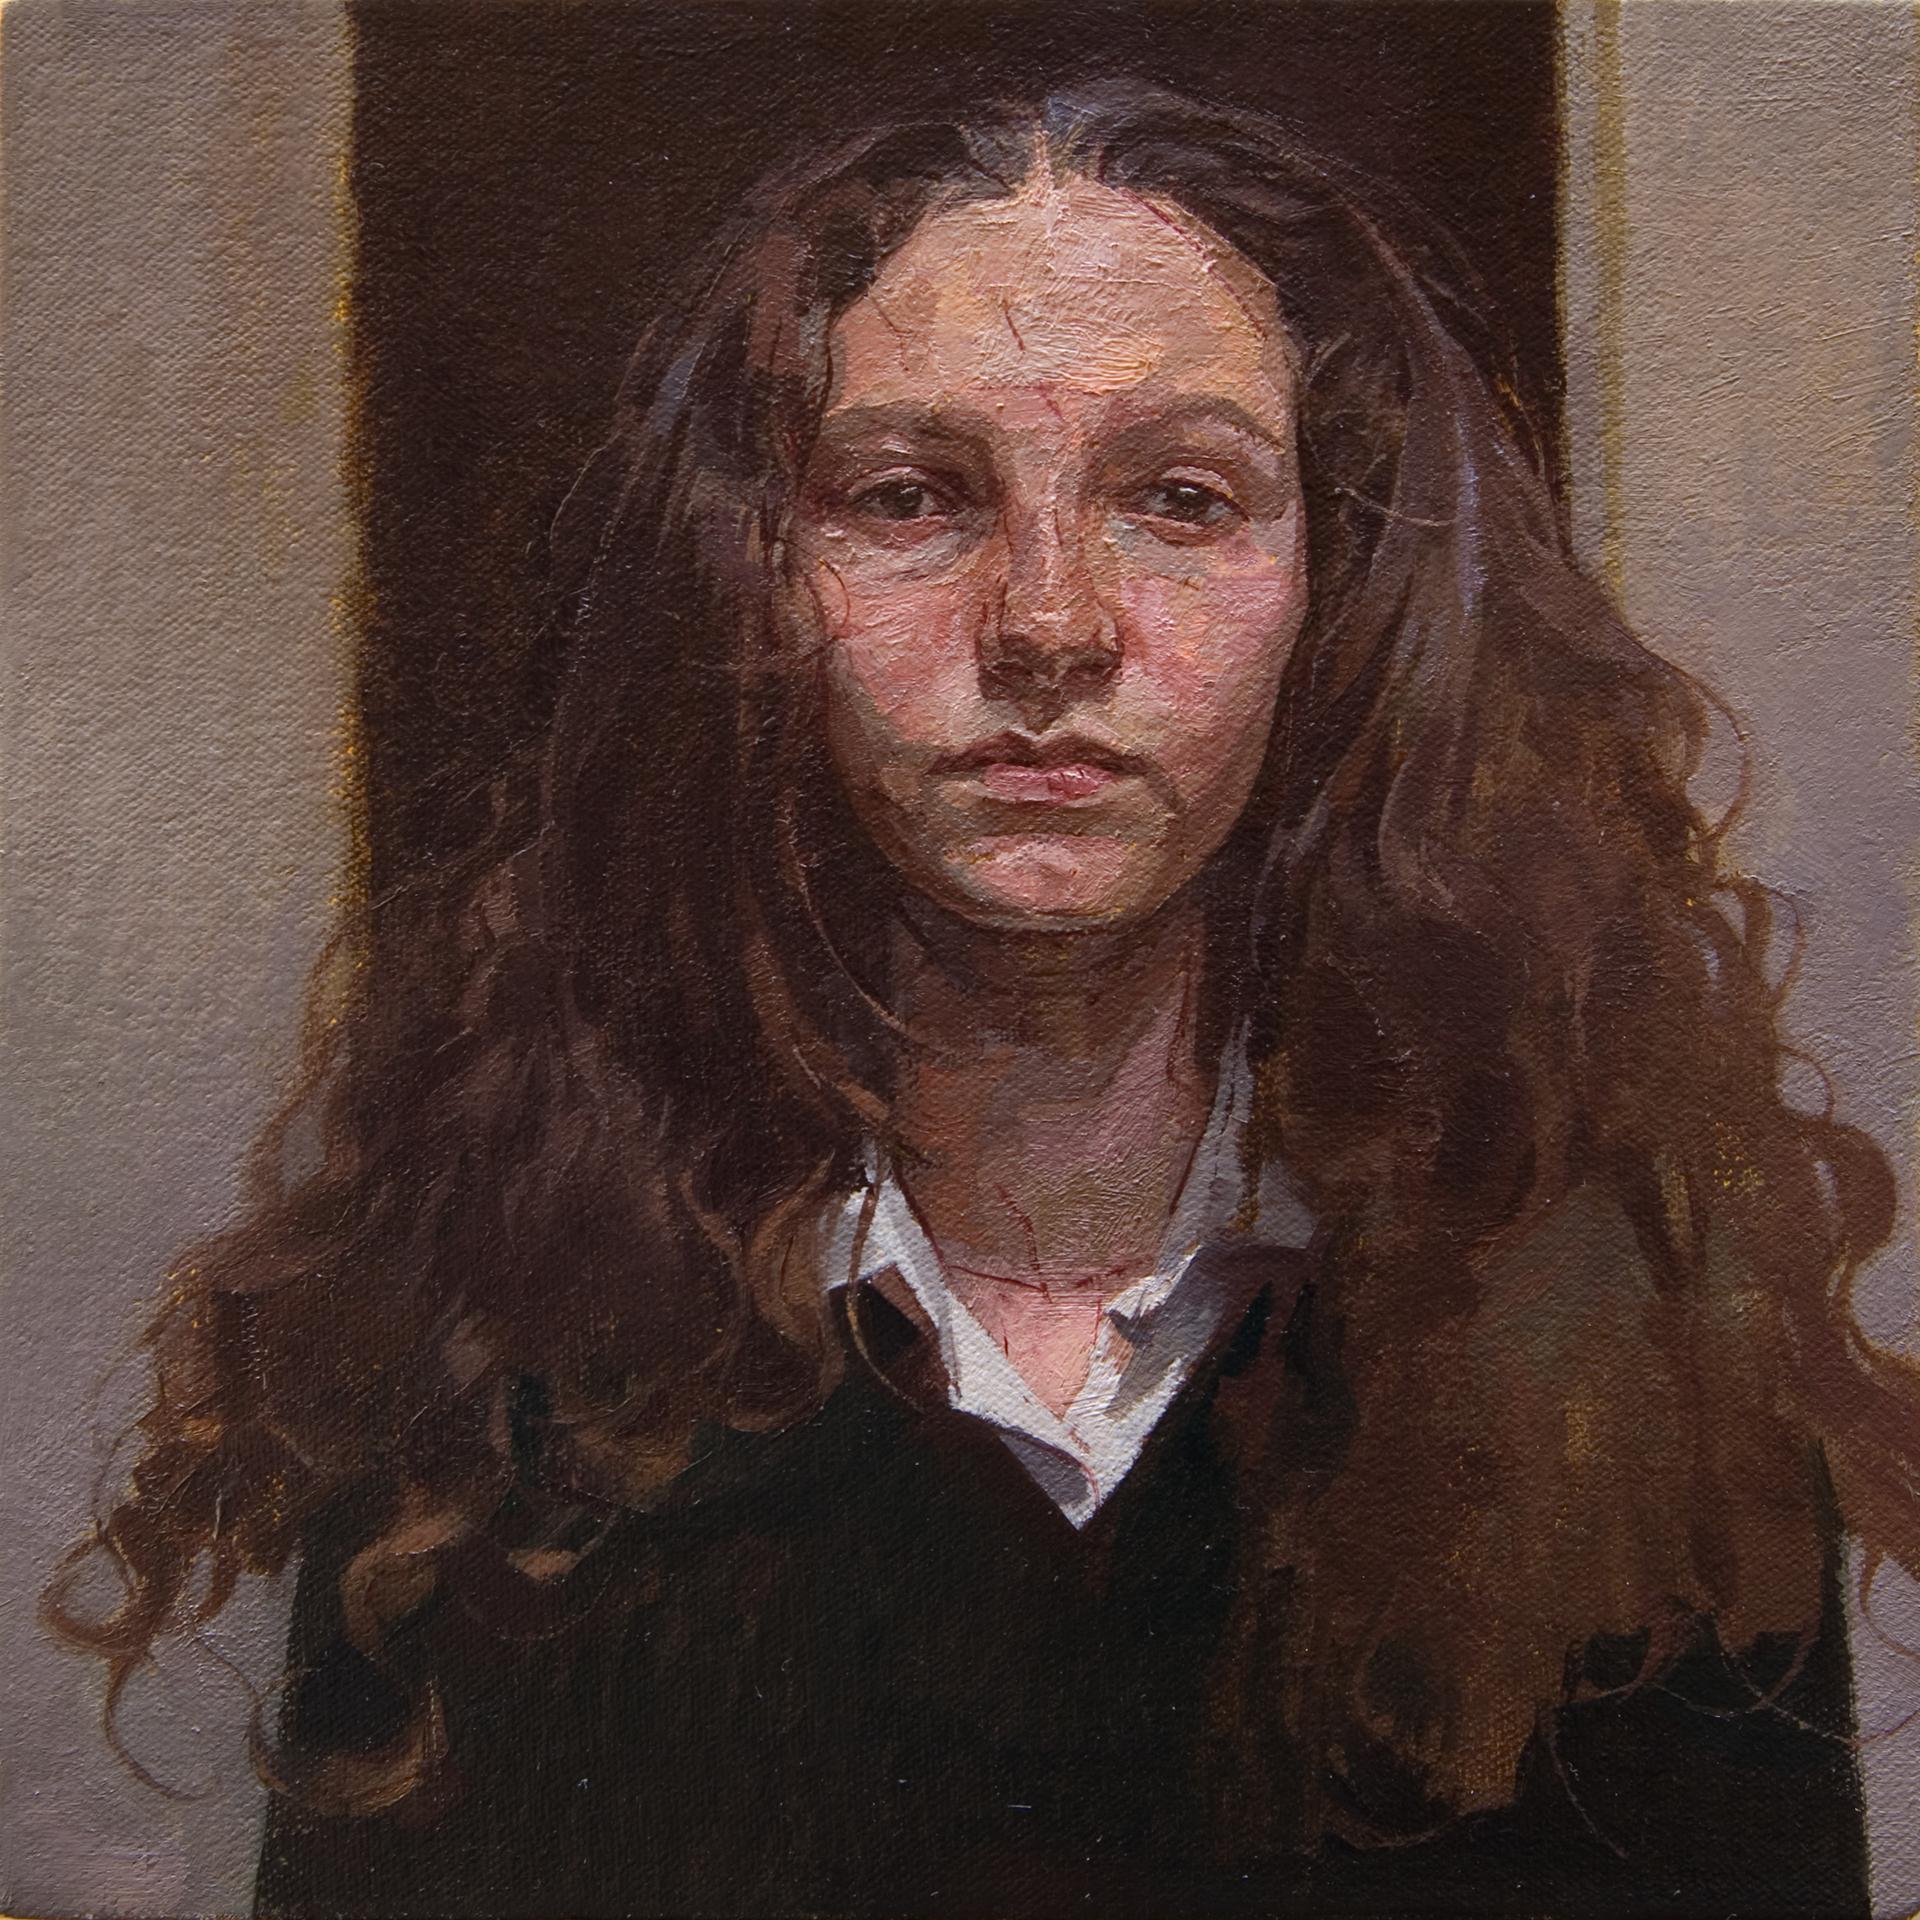 Cristina by Nicolás Uribe